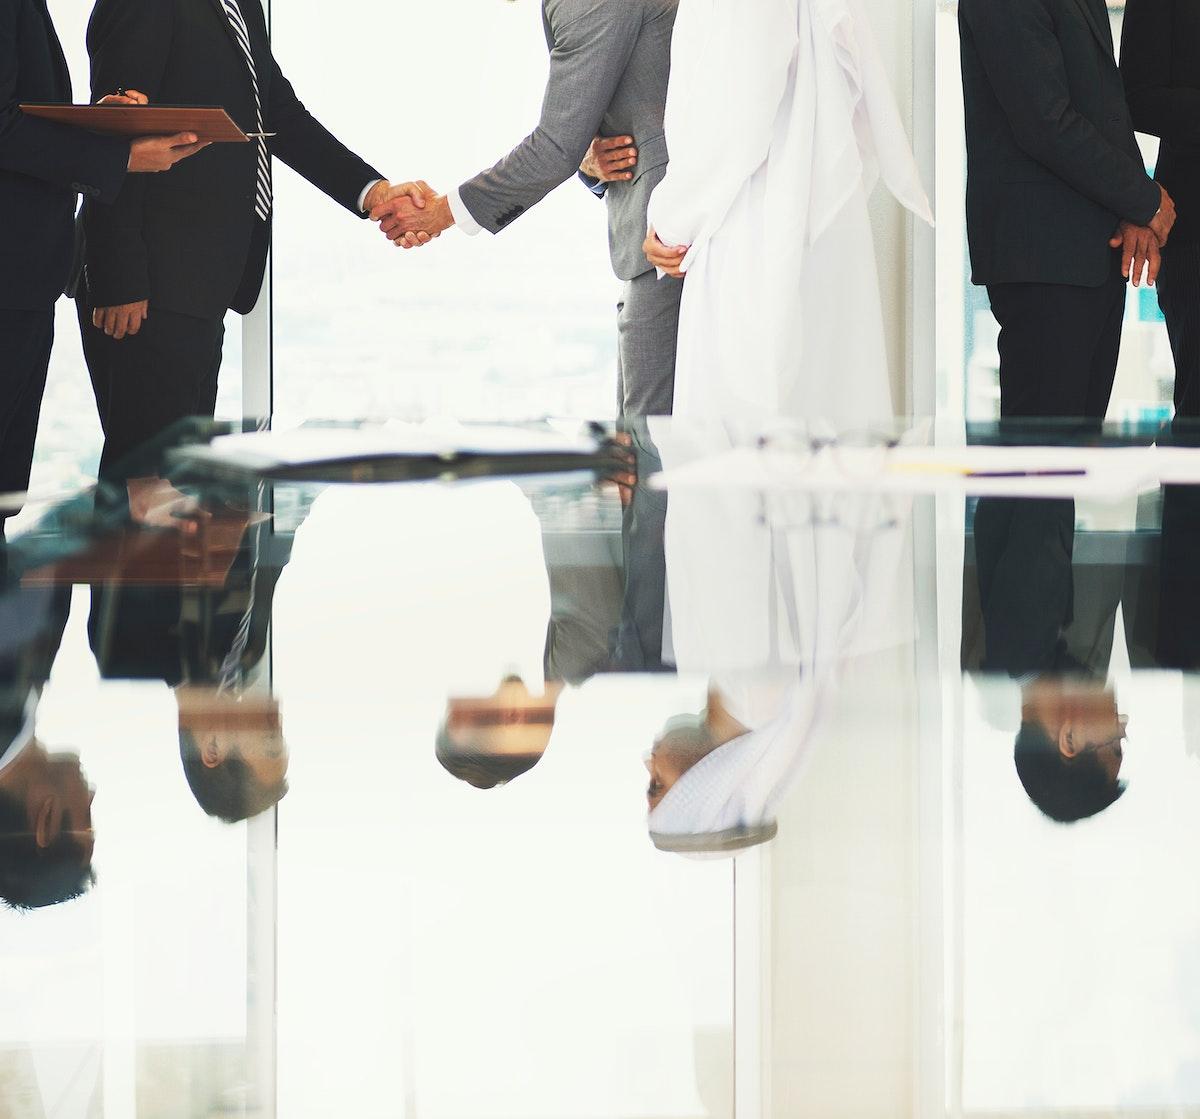 Corporate business people handshaking